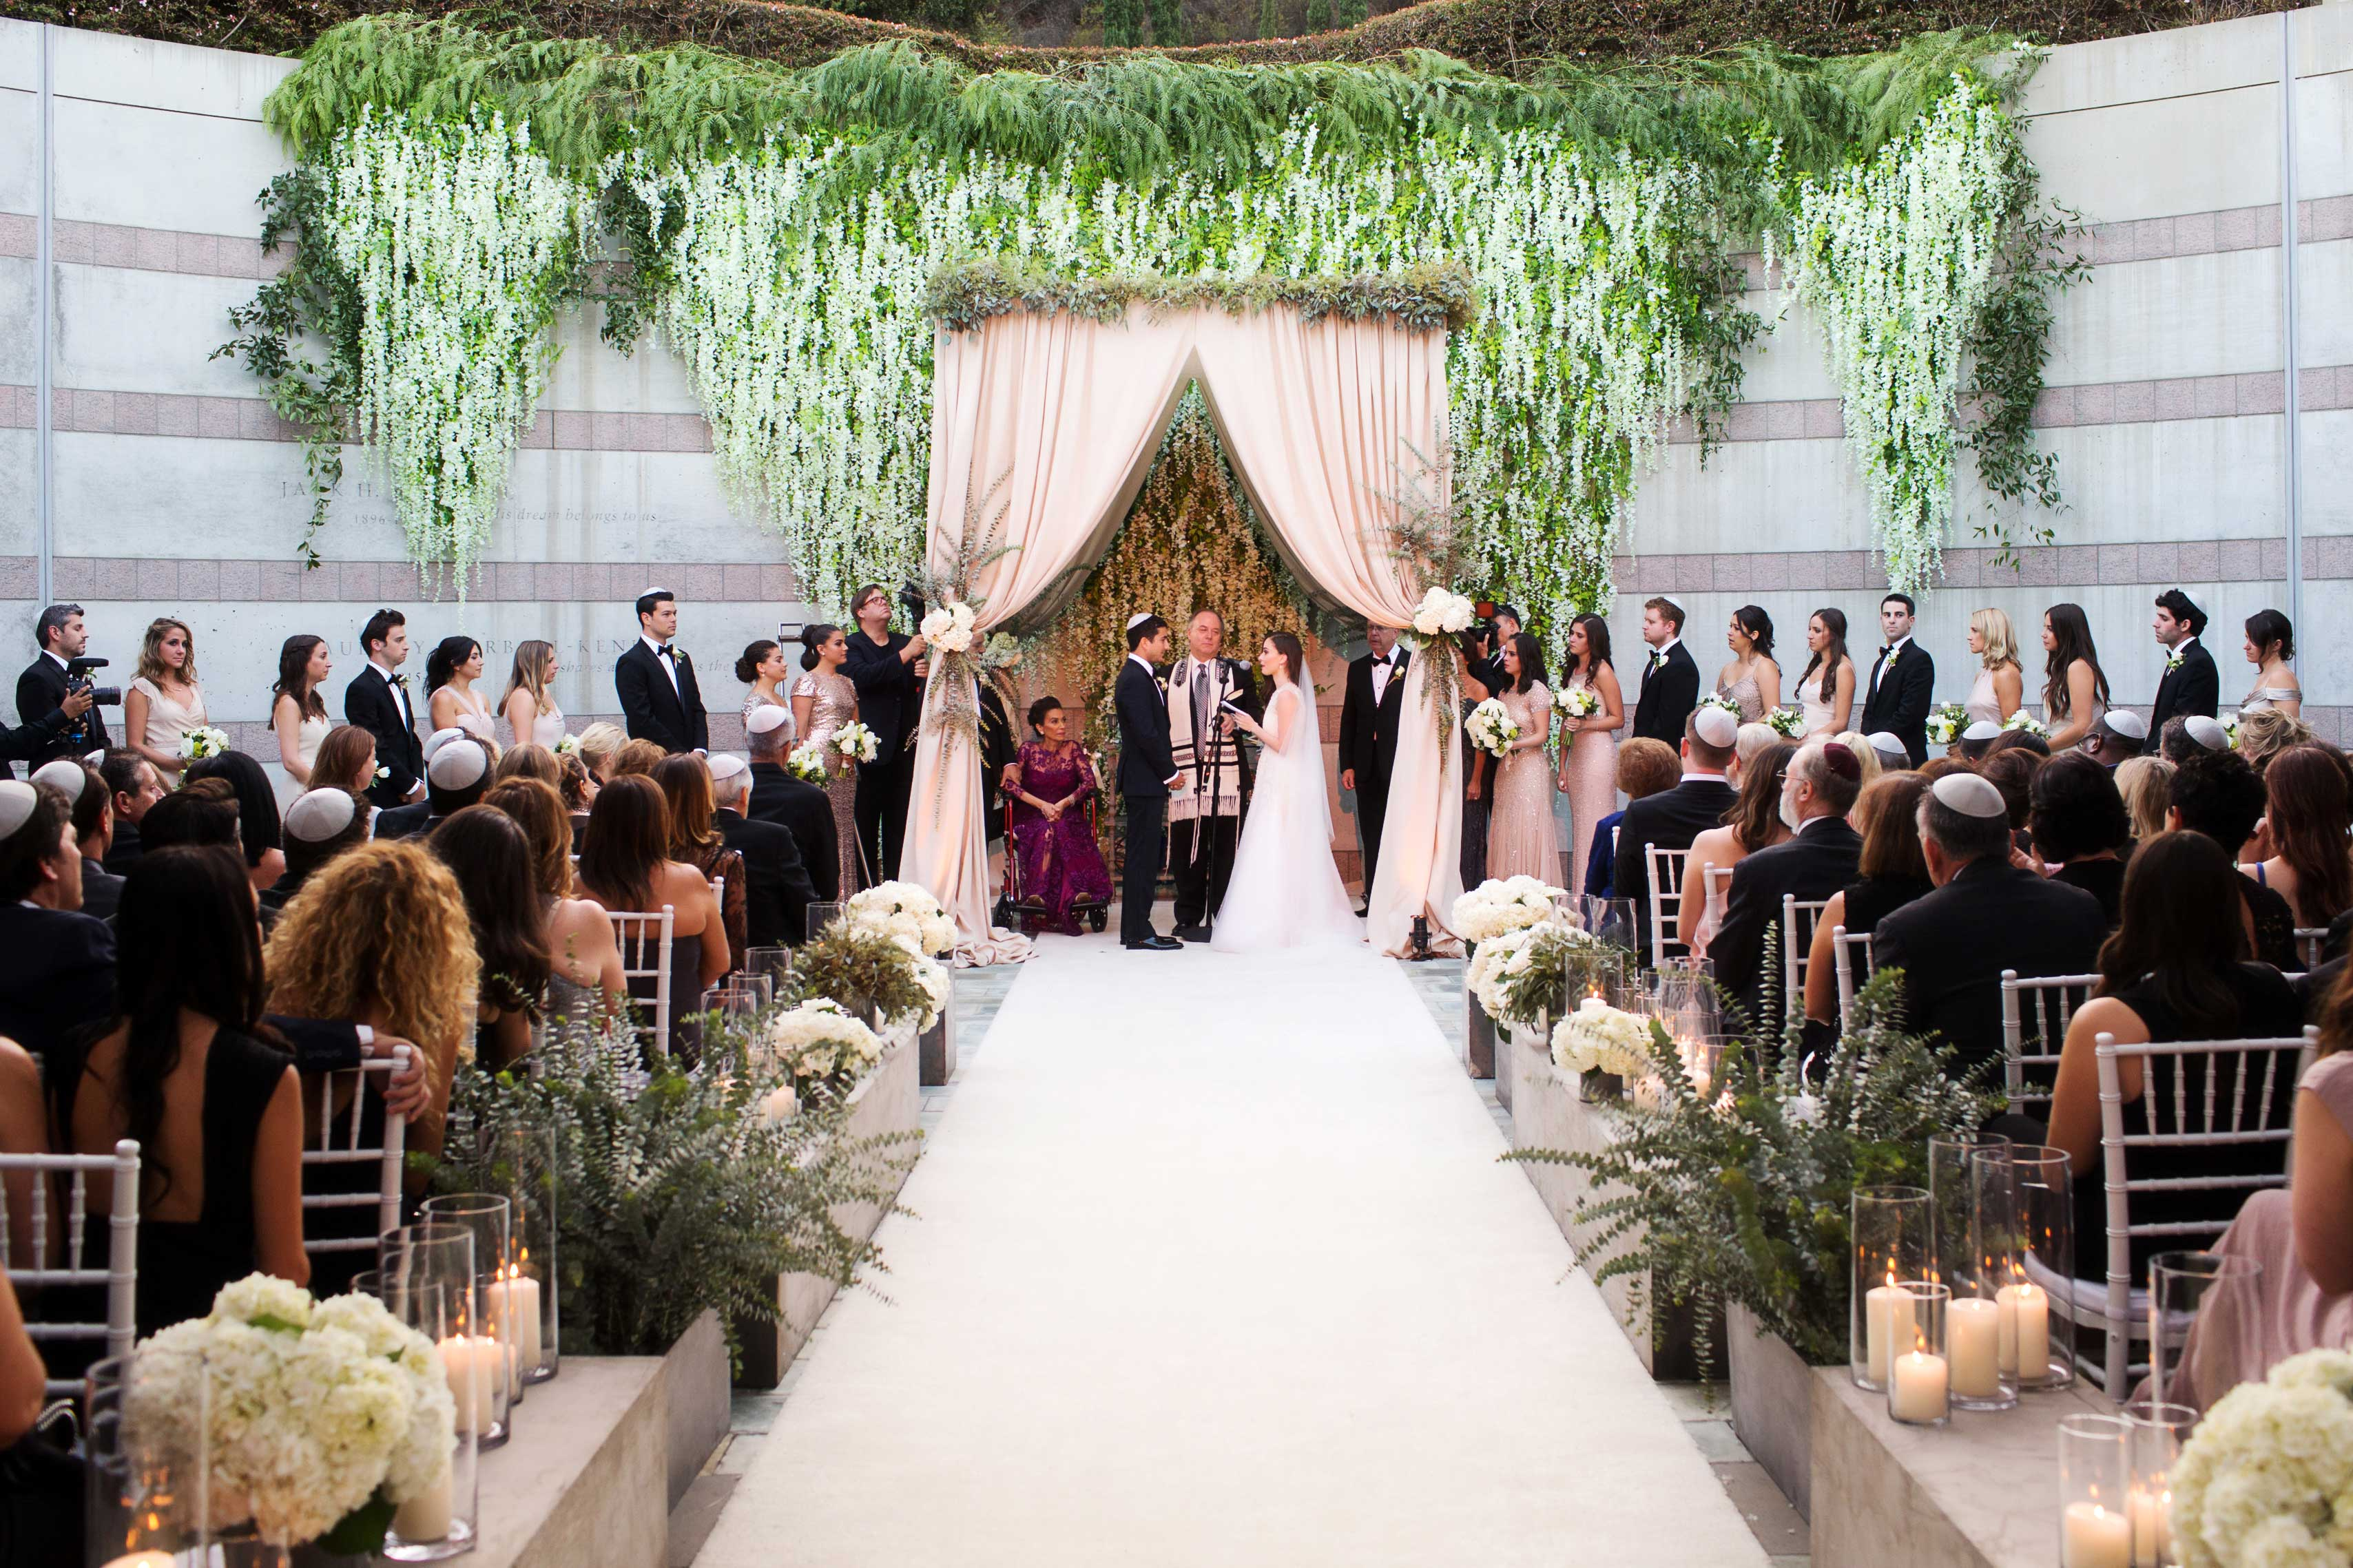 Beautiful wedding ceremony outdoor at Skirball Cultural Center flowers by The Hidden Garden Geller Events